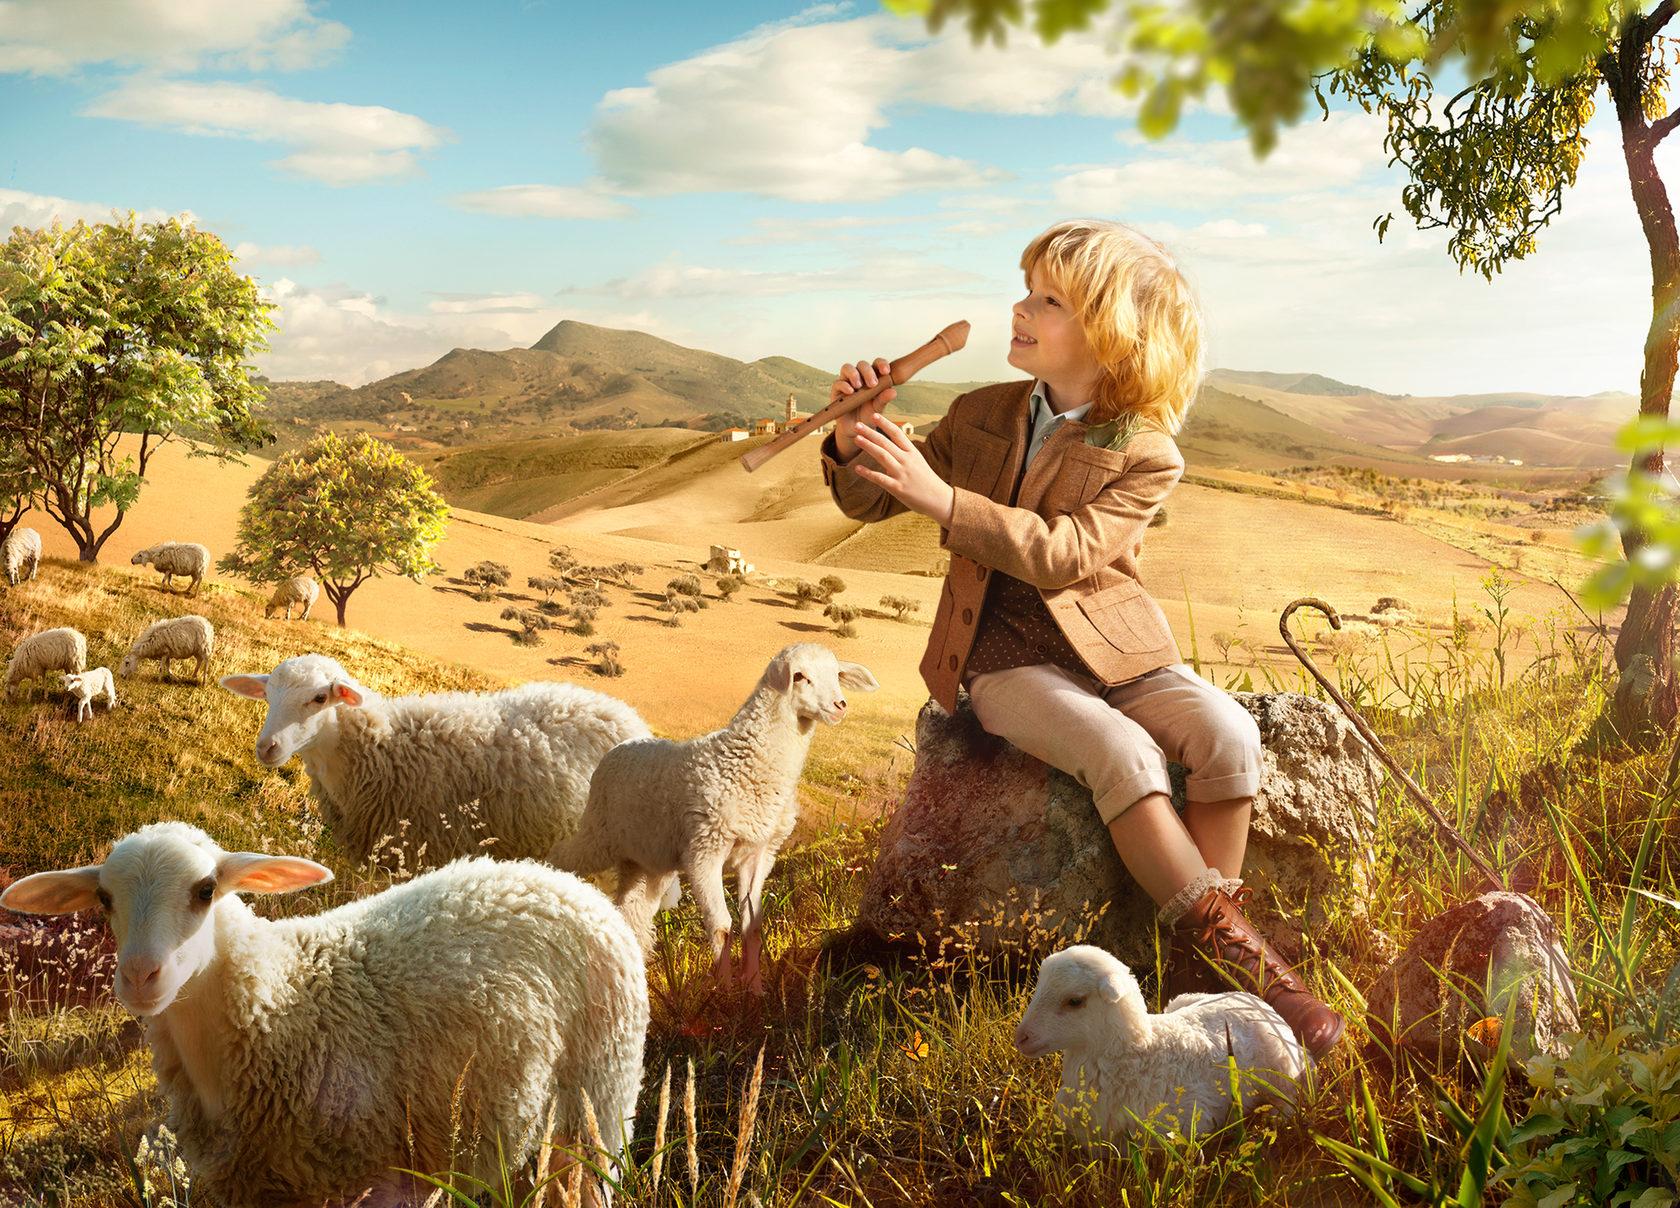 жизнь два пастуха картинки такую